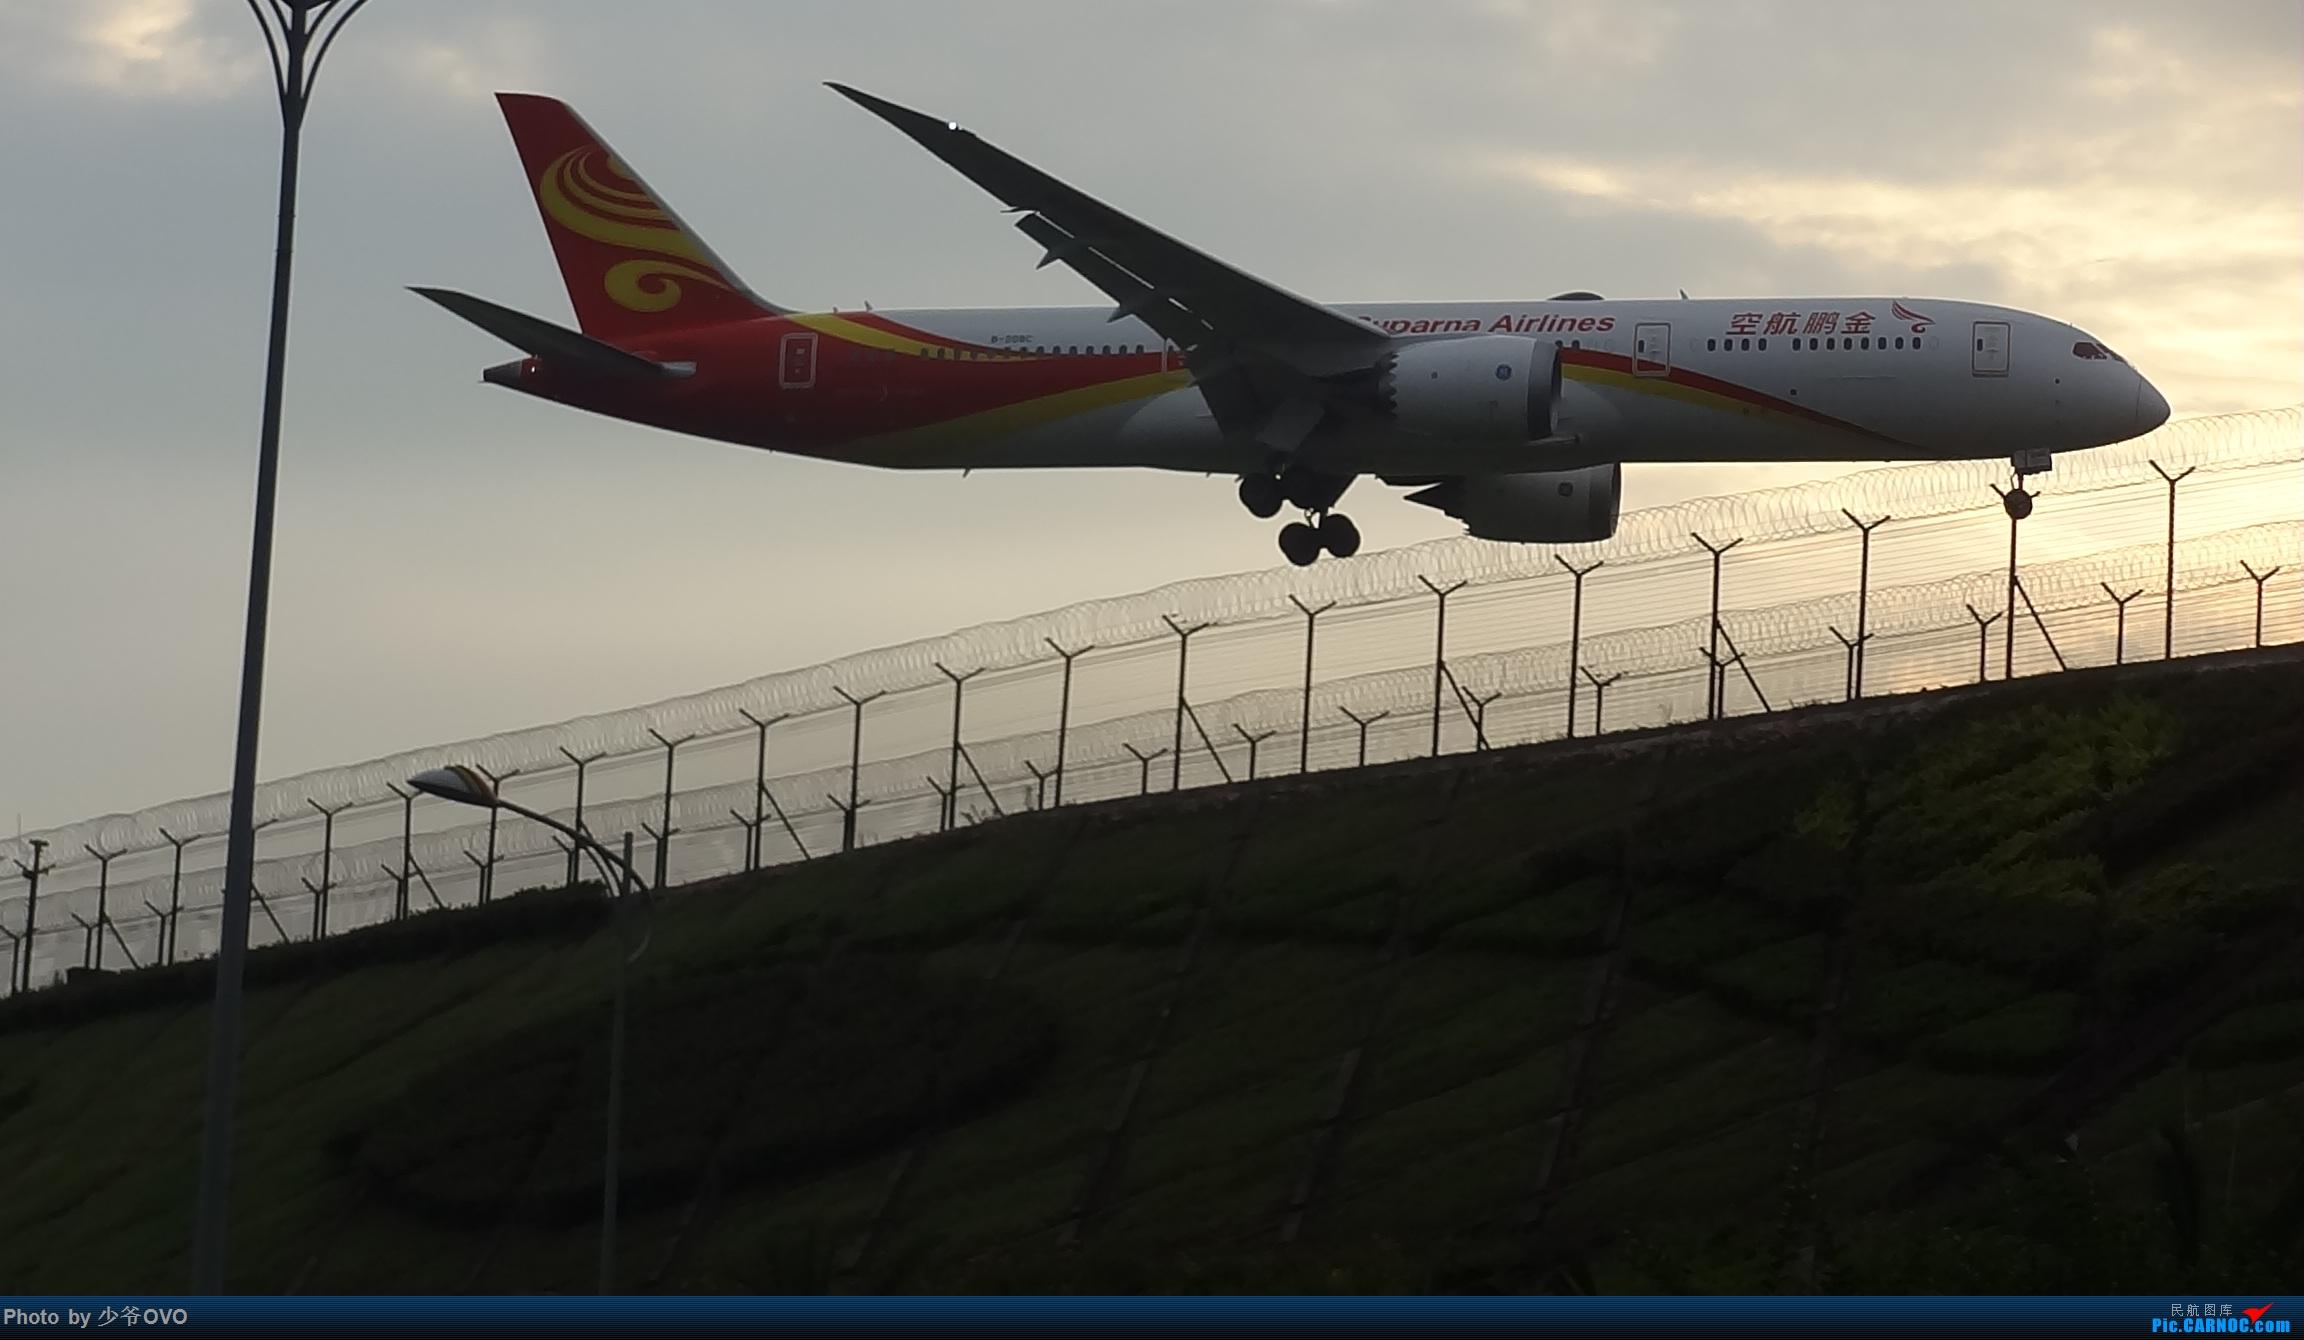 Re:[原创]CKG拍机,数码机最后的倔强 BOEING 787-9 B-208C 中国重庆江北国际机场